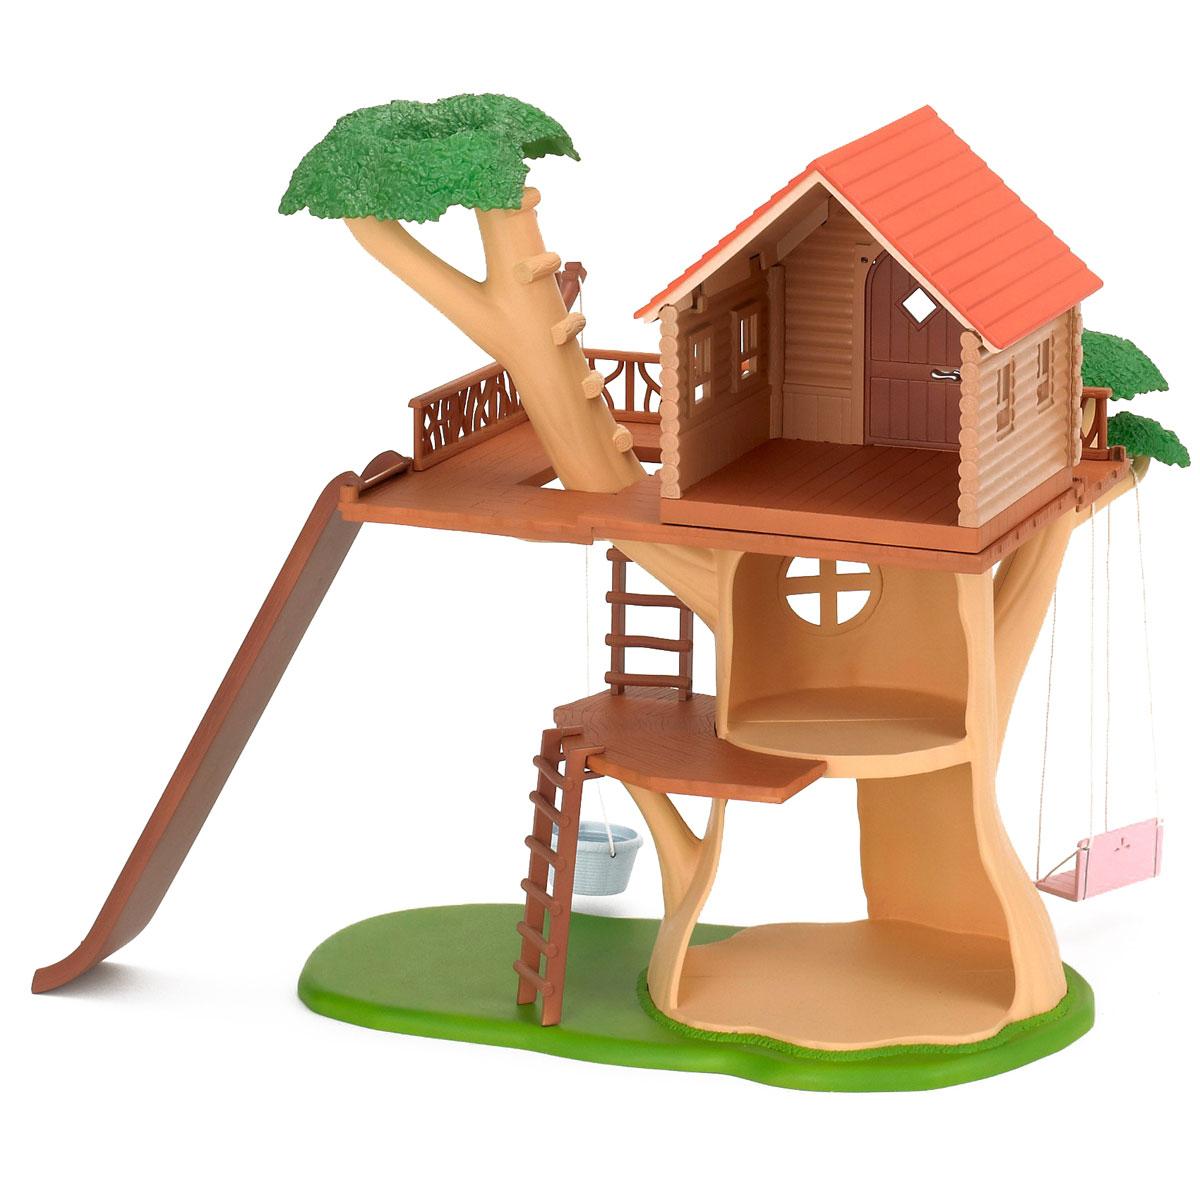 Sylvanian Families Игровой набор Дом-дерево дерево дом sylvanian families